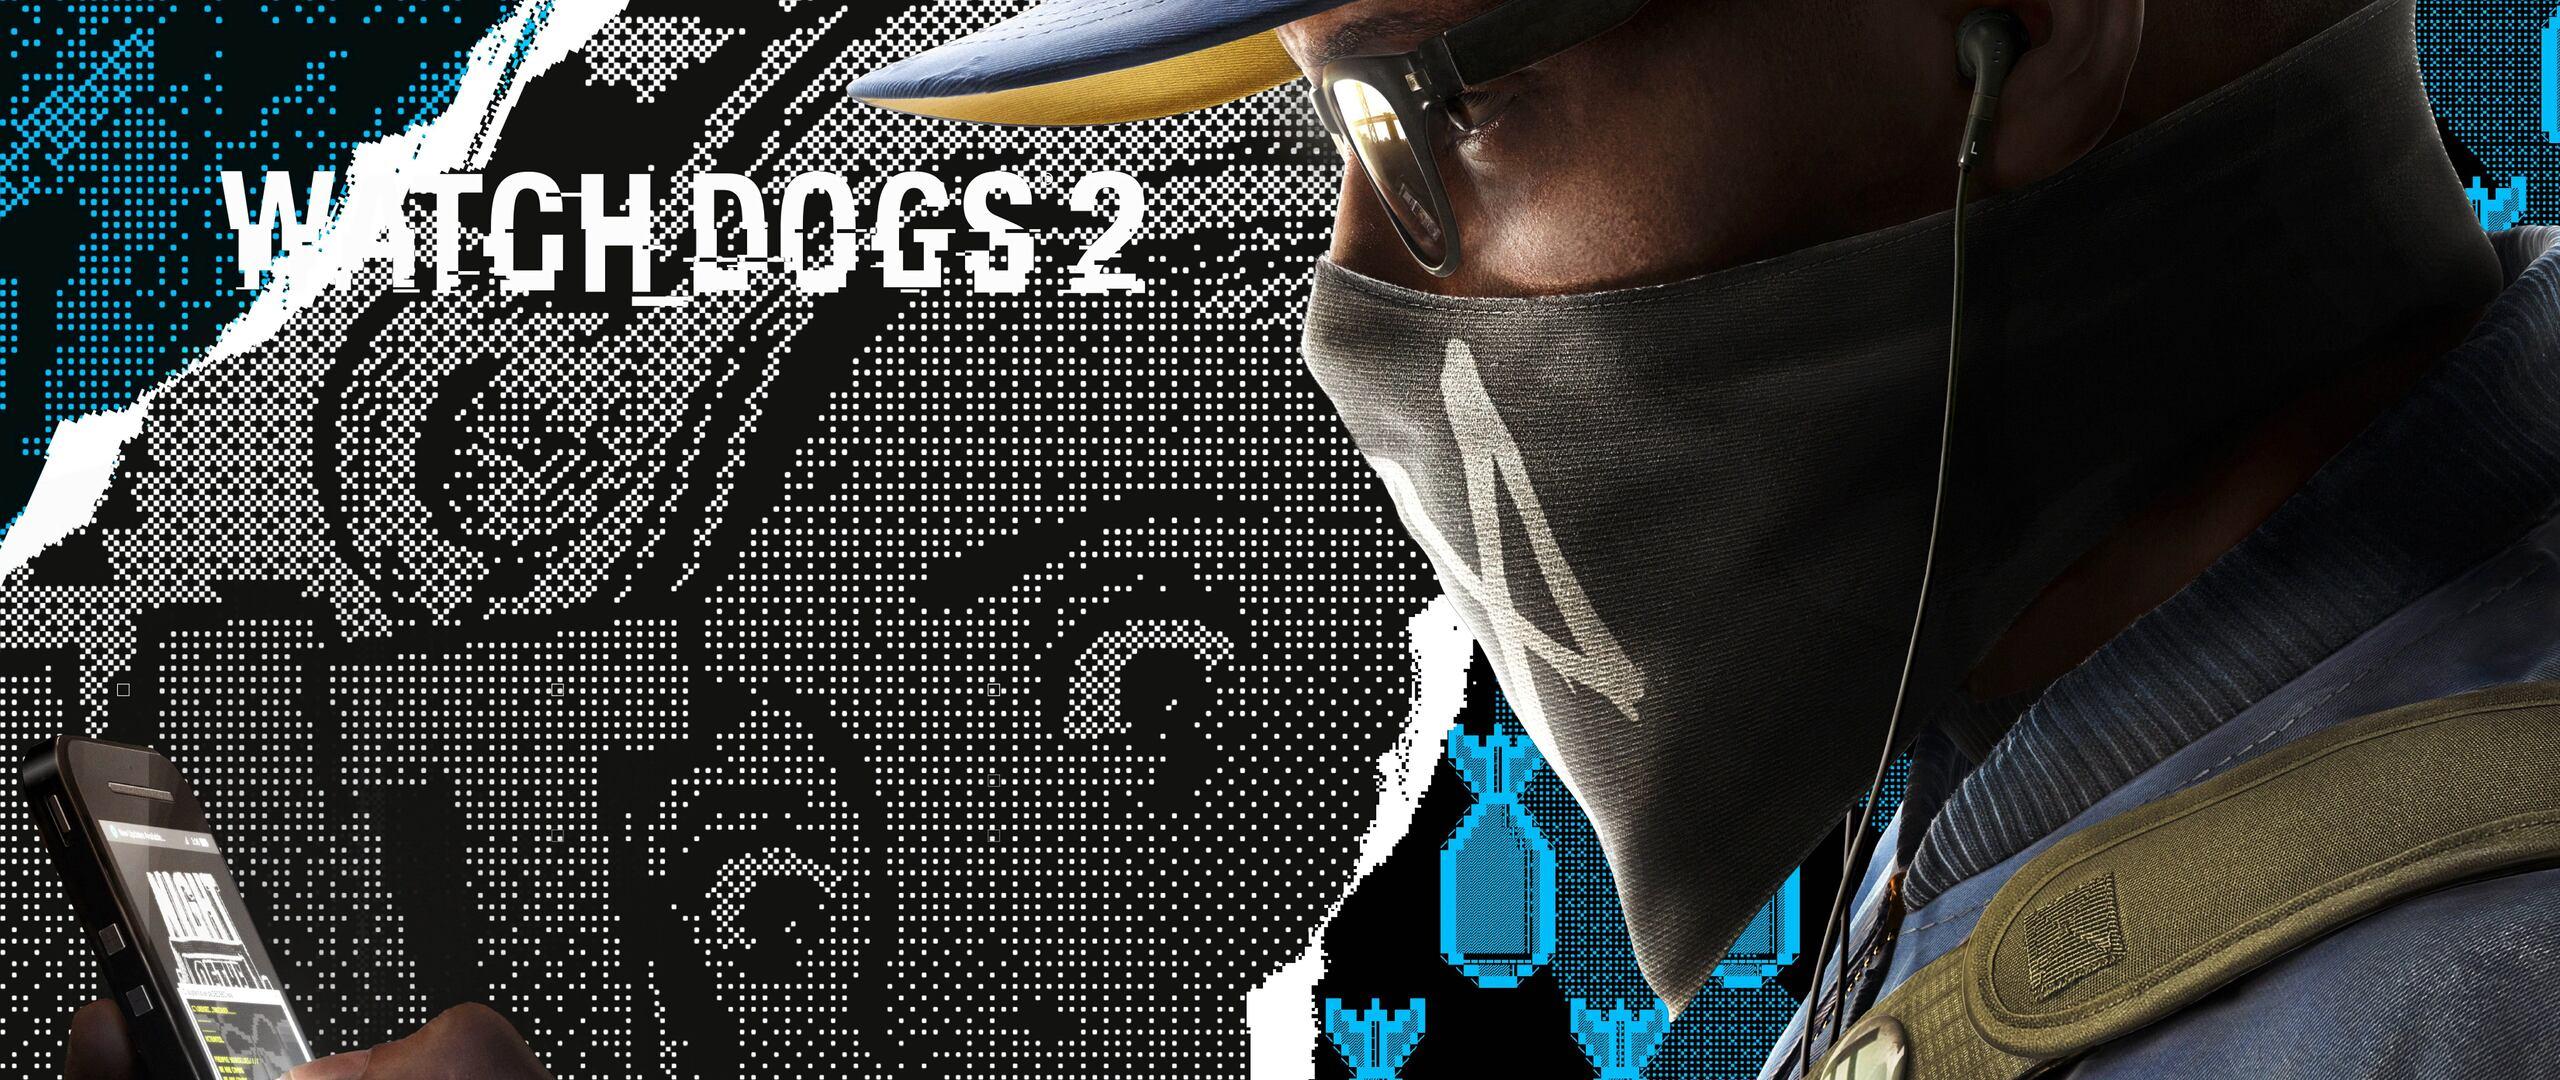 Watch Dogs 2 Wallpaper Download Free Beautiful: 2560x1080 Watch Dogs 2 8k 2560x1080 Resolution HD 4k